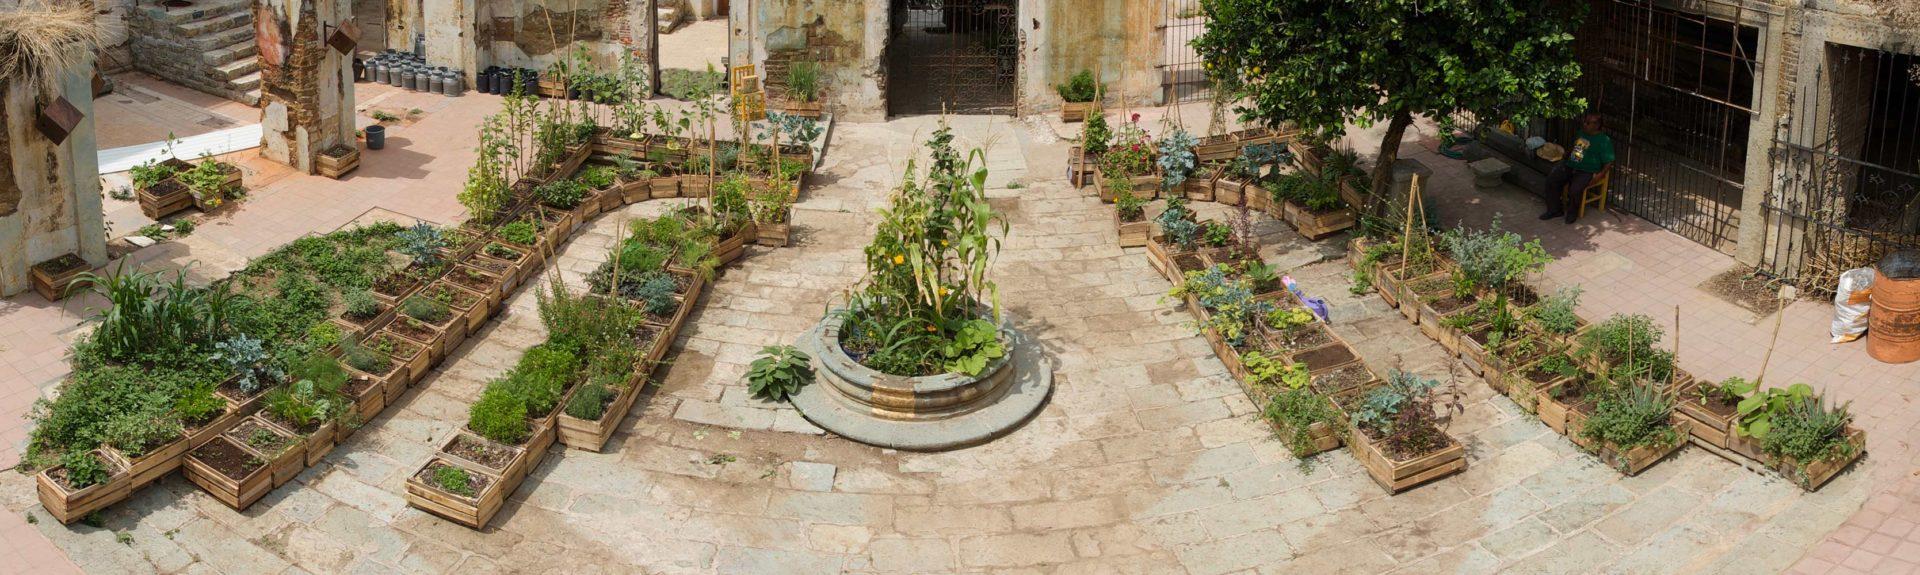 JardinAbrazo01